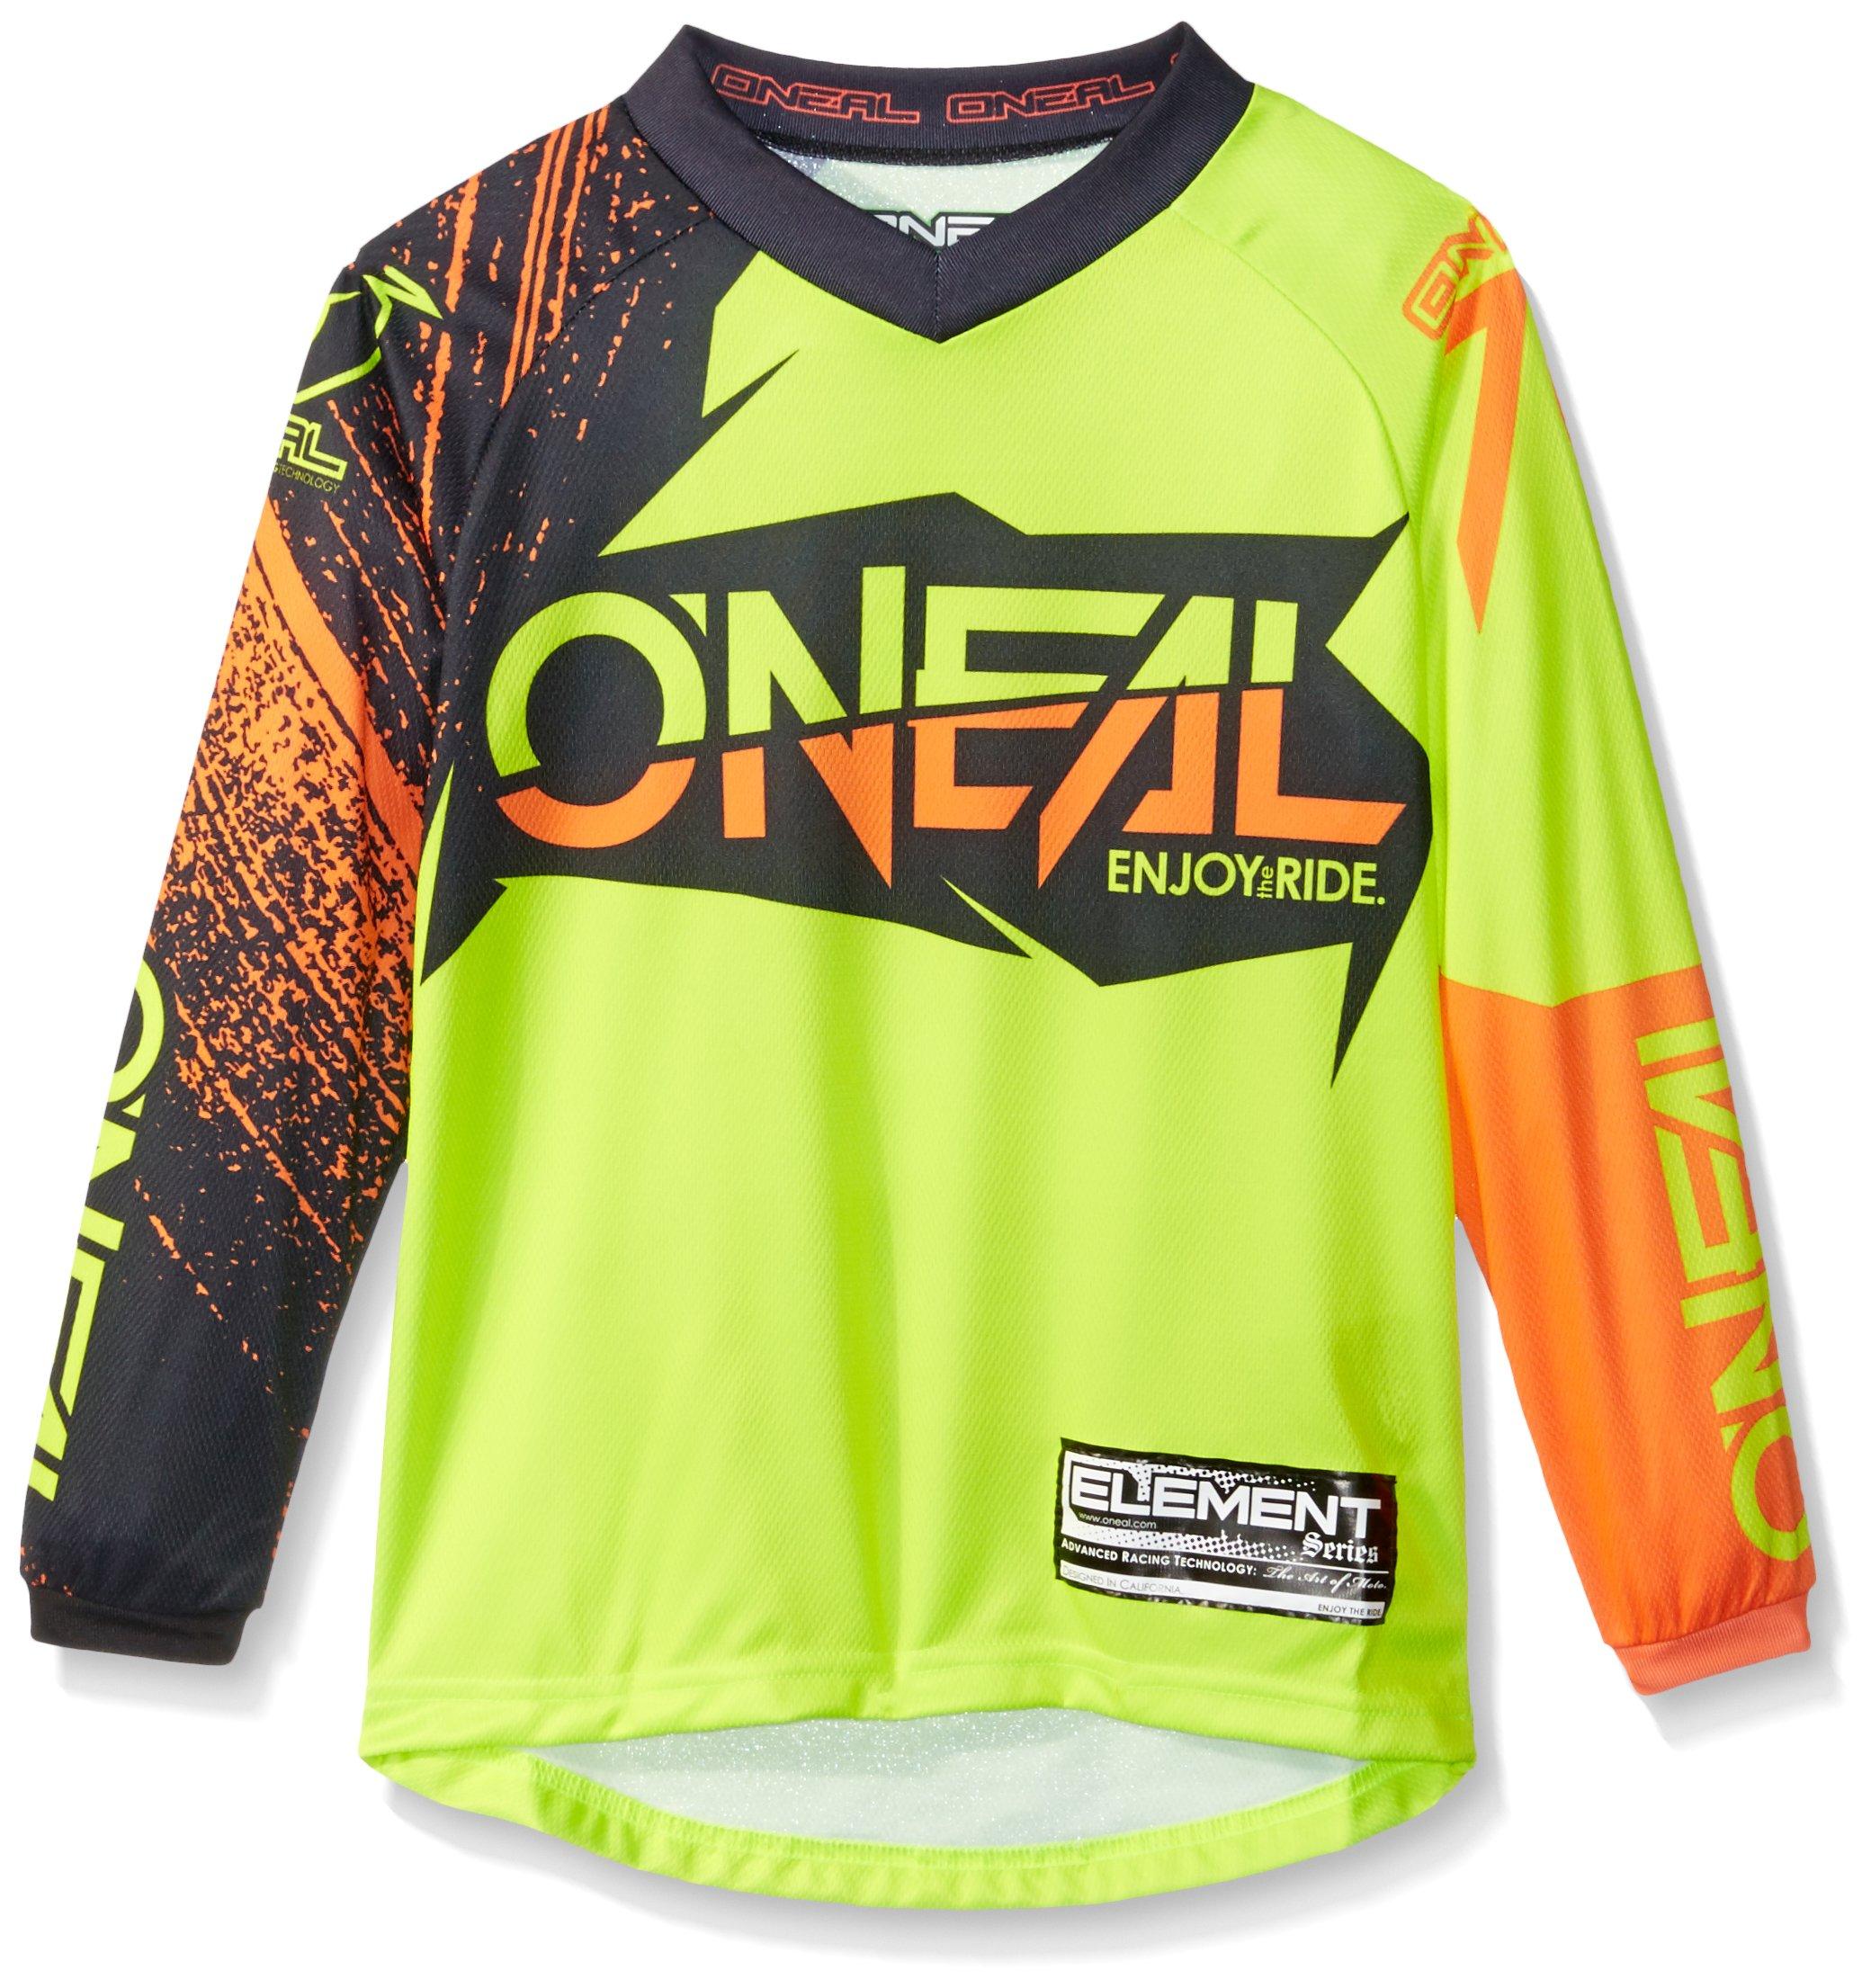 O'Neal Youth Element Burnout Jersey (Black/Hi-Viz/Orange, Small)